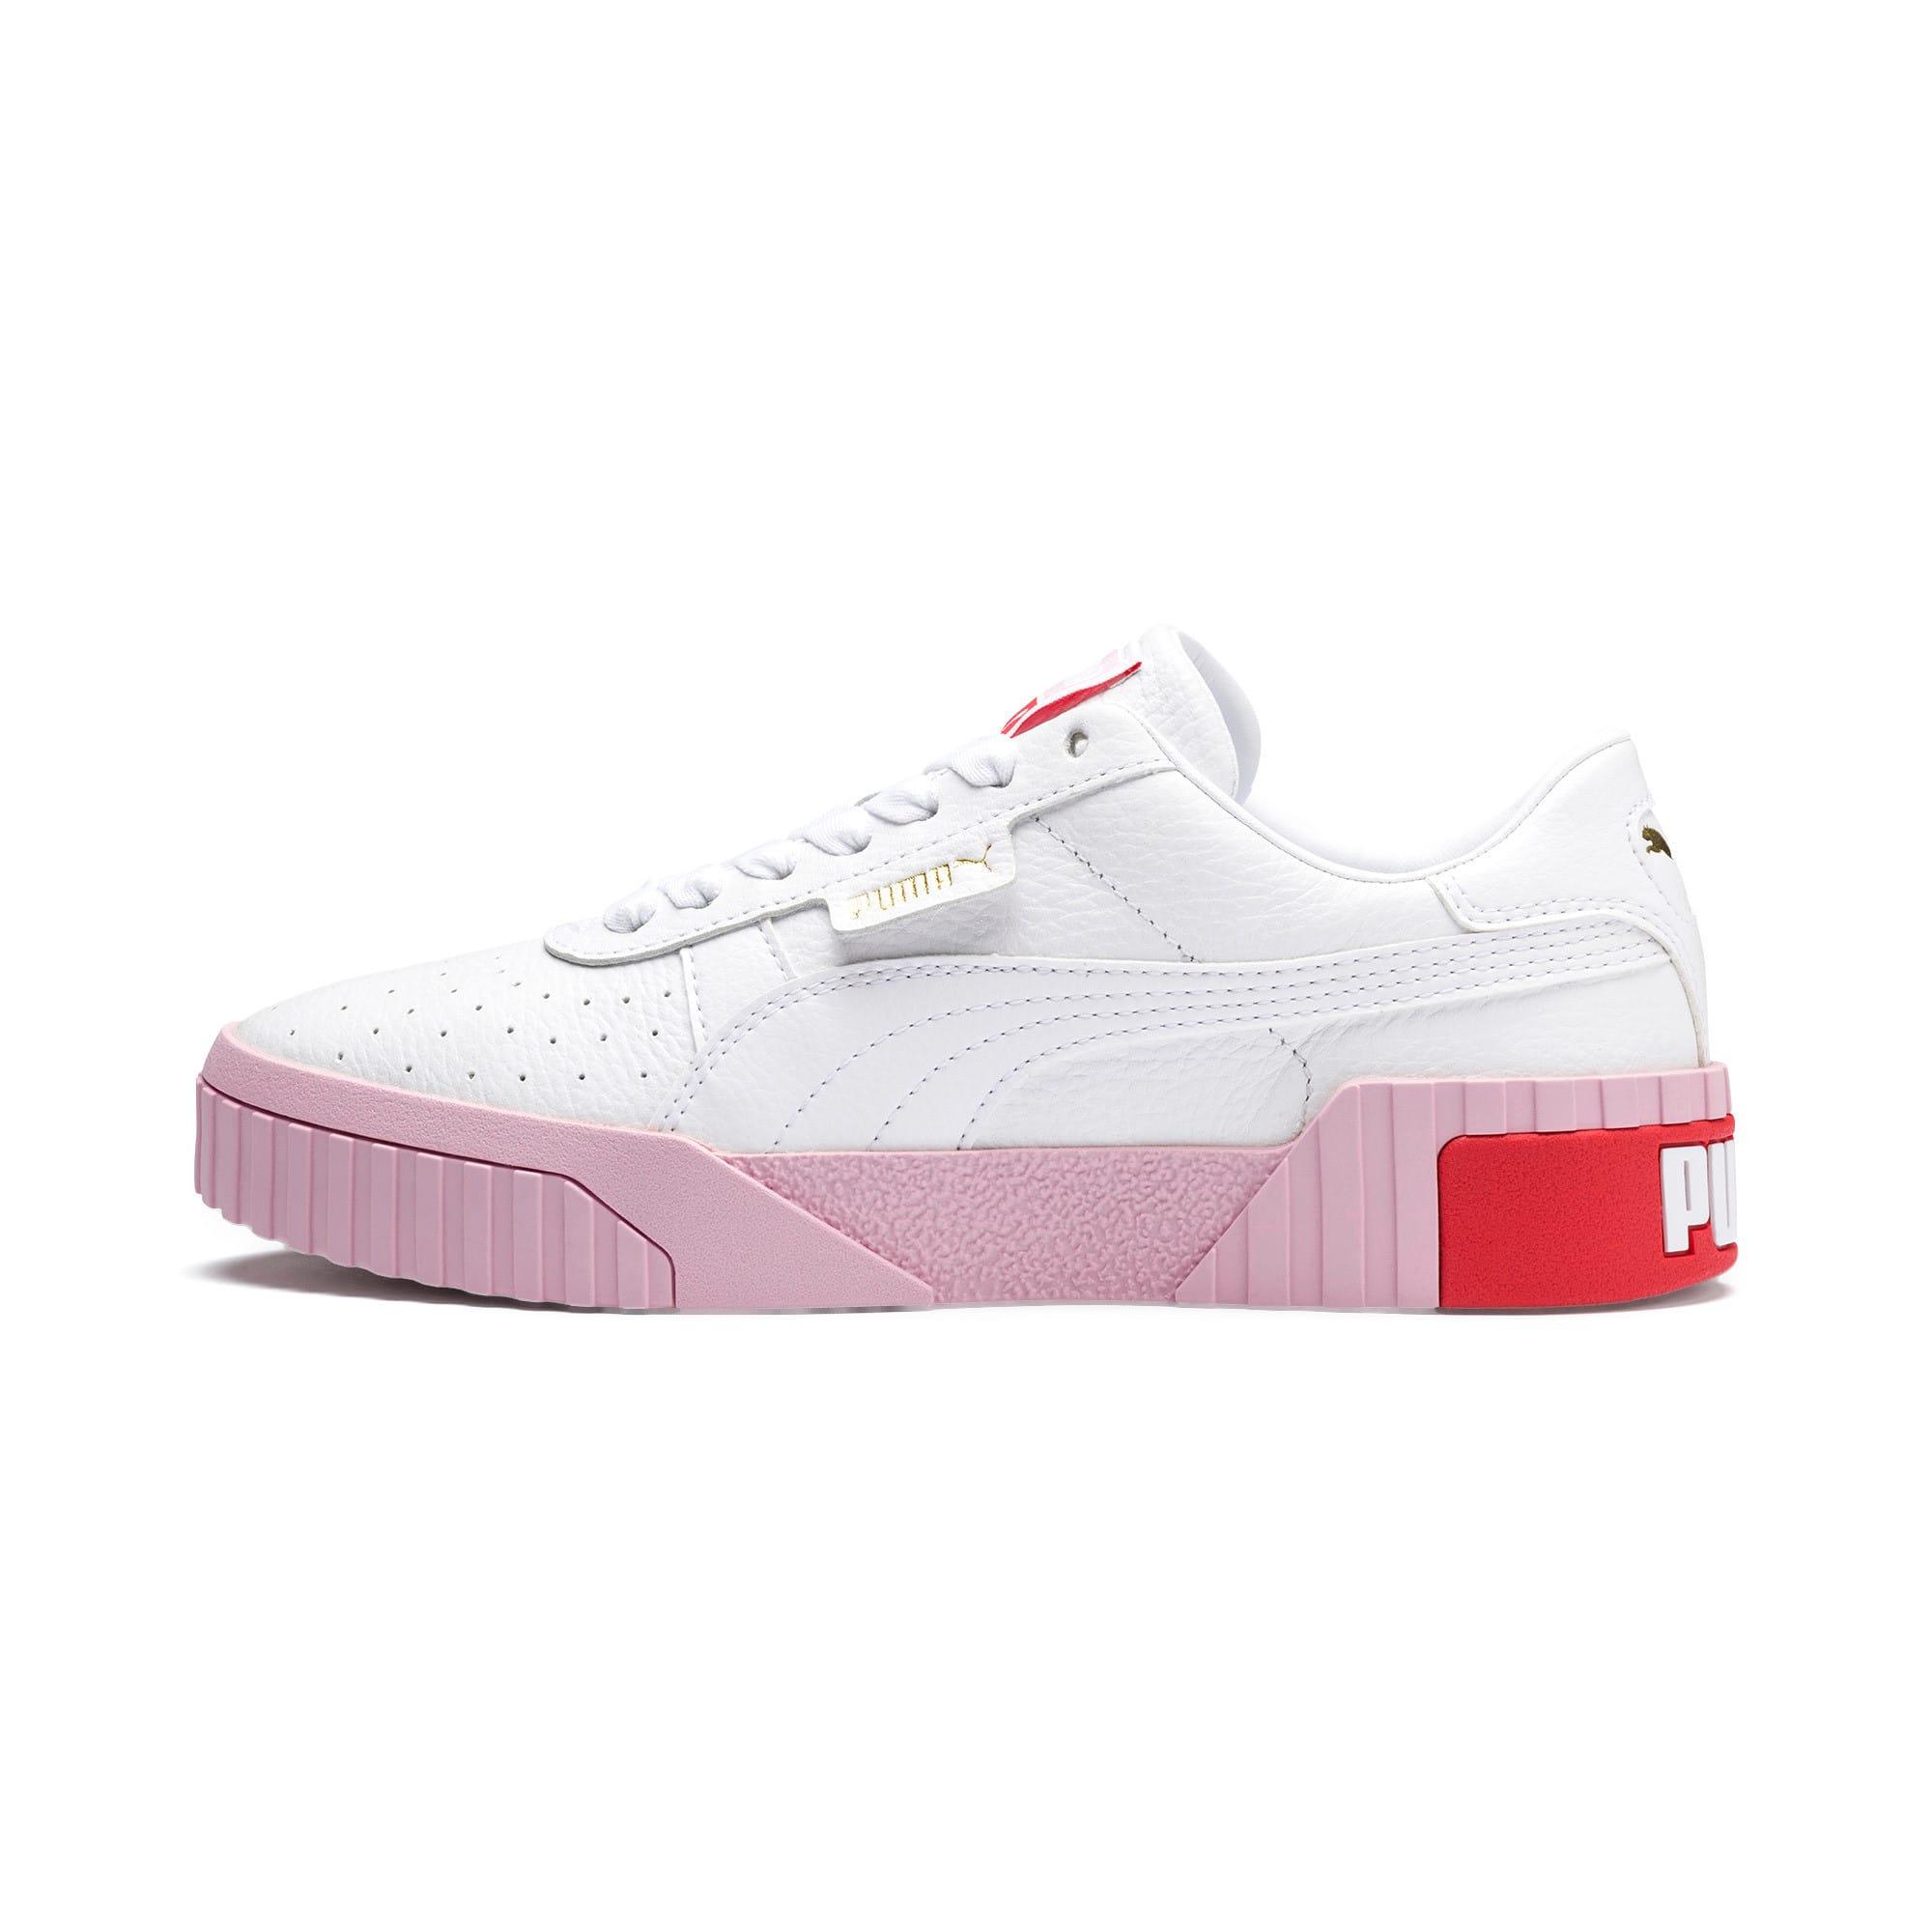 Thumbnail 1 of Basket Cali pour femme, Puma White-Pale Pink, medium